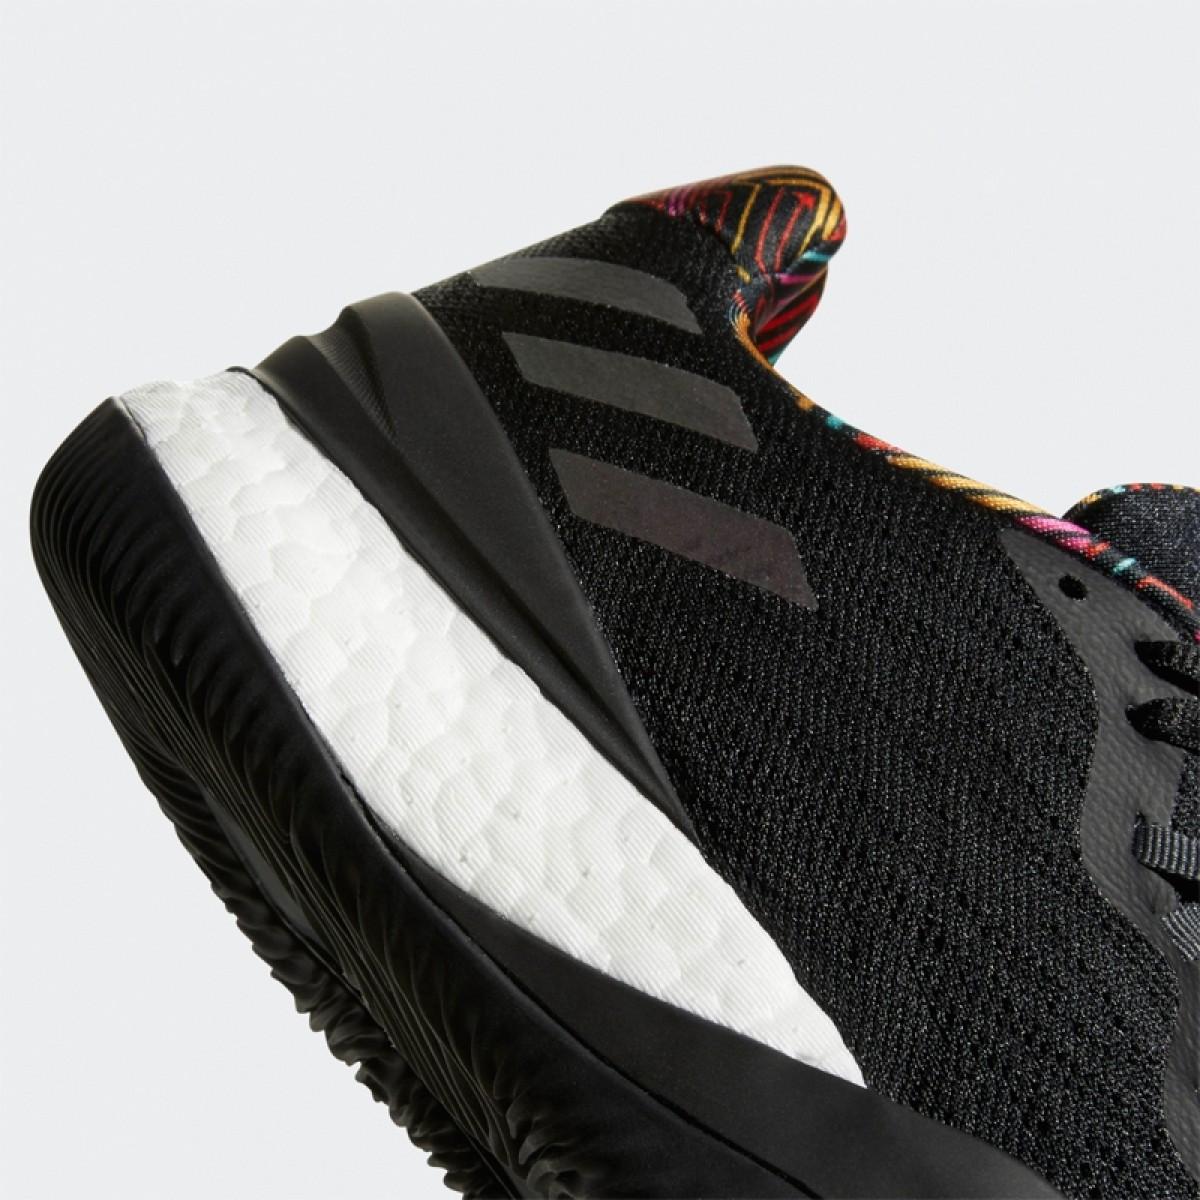 Extra exposición descanso  Buy ADIDAS Crazy Light Boost 2018 'Summer Pack Black' Basketball shoes &  sneakers